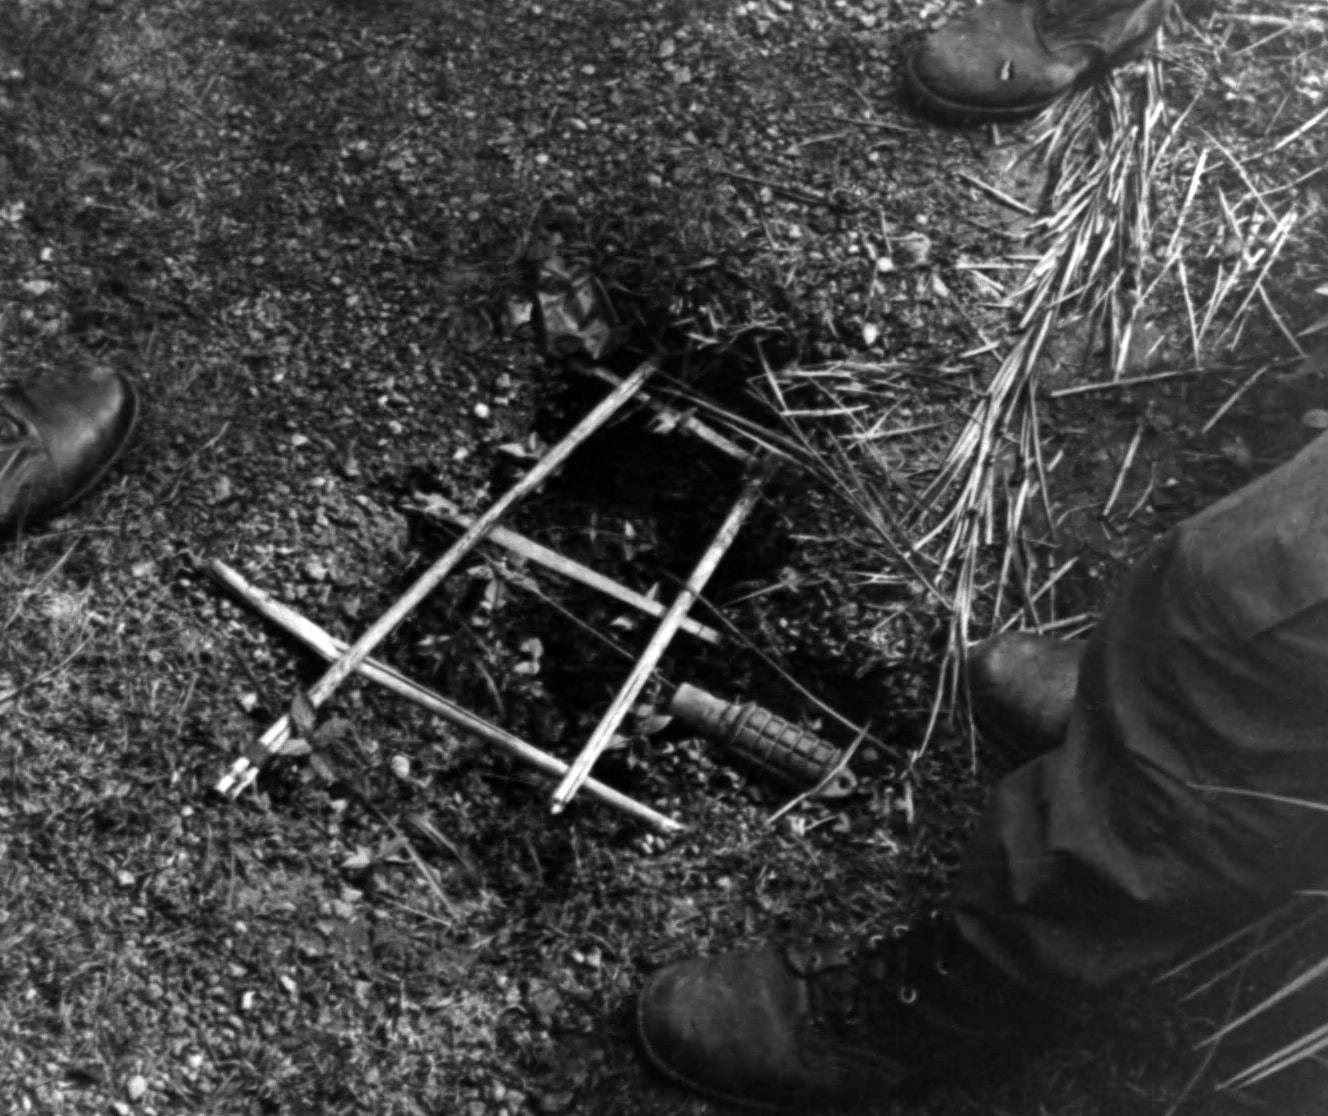 USMC training on Viet Cong traps